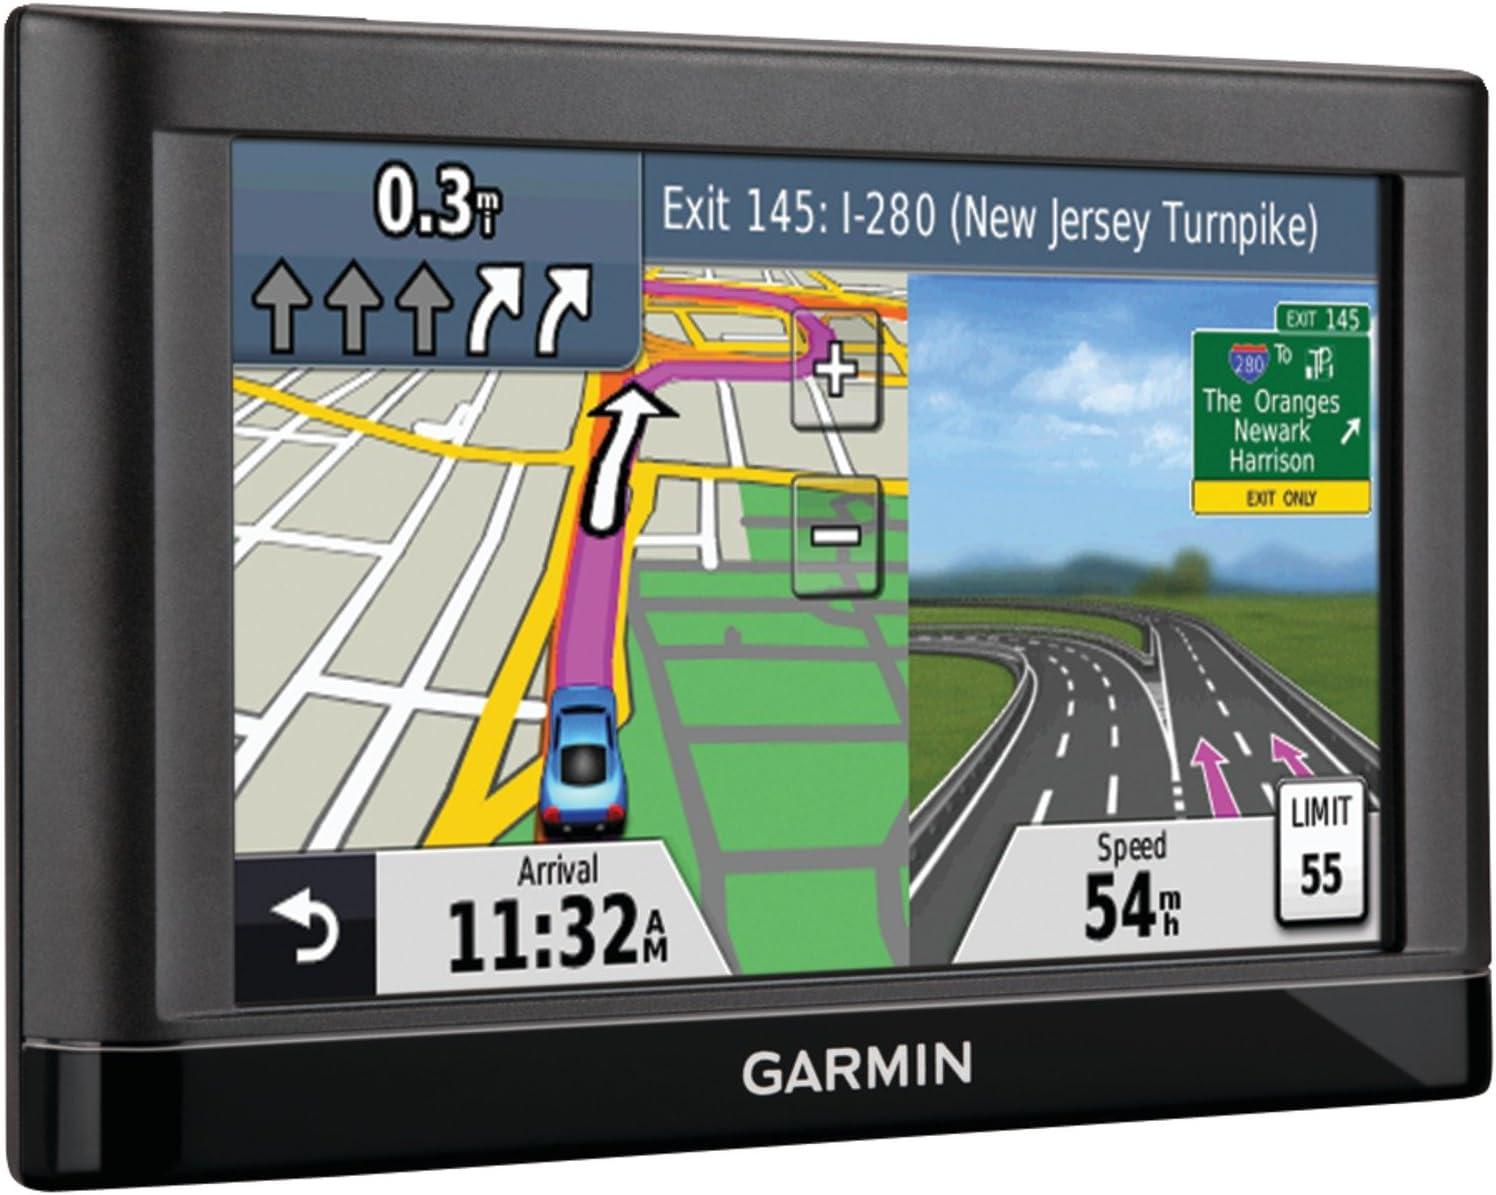 Garmin Nuvi 52 Canada Map Download Amazon.com: Garmin nüvi 52LM 5 Inch Portable Vehicle GPS with